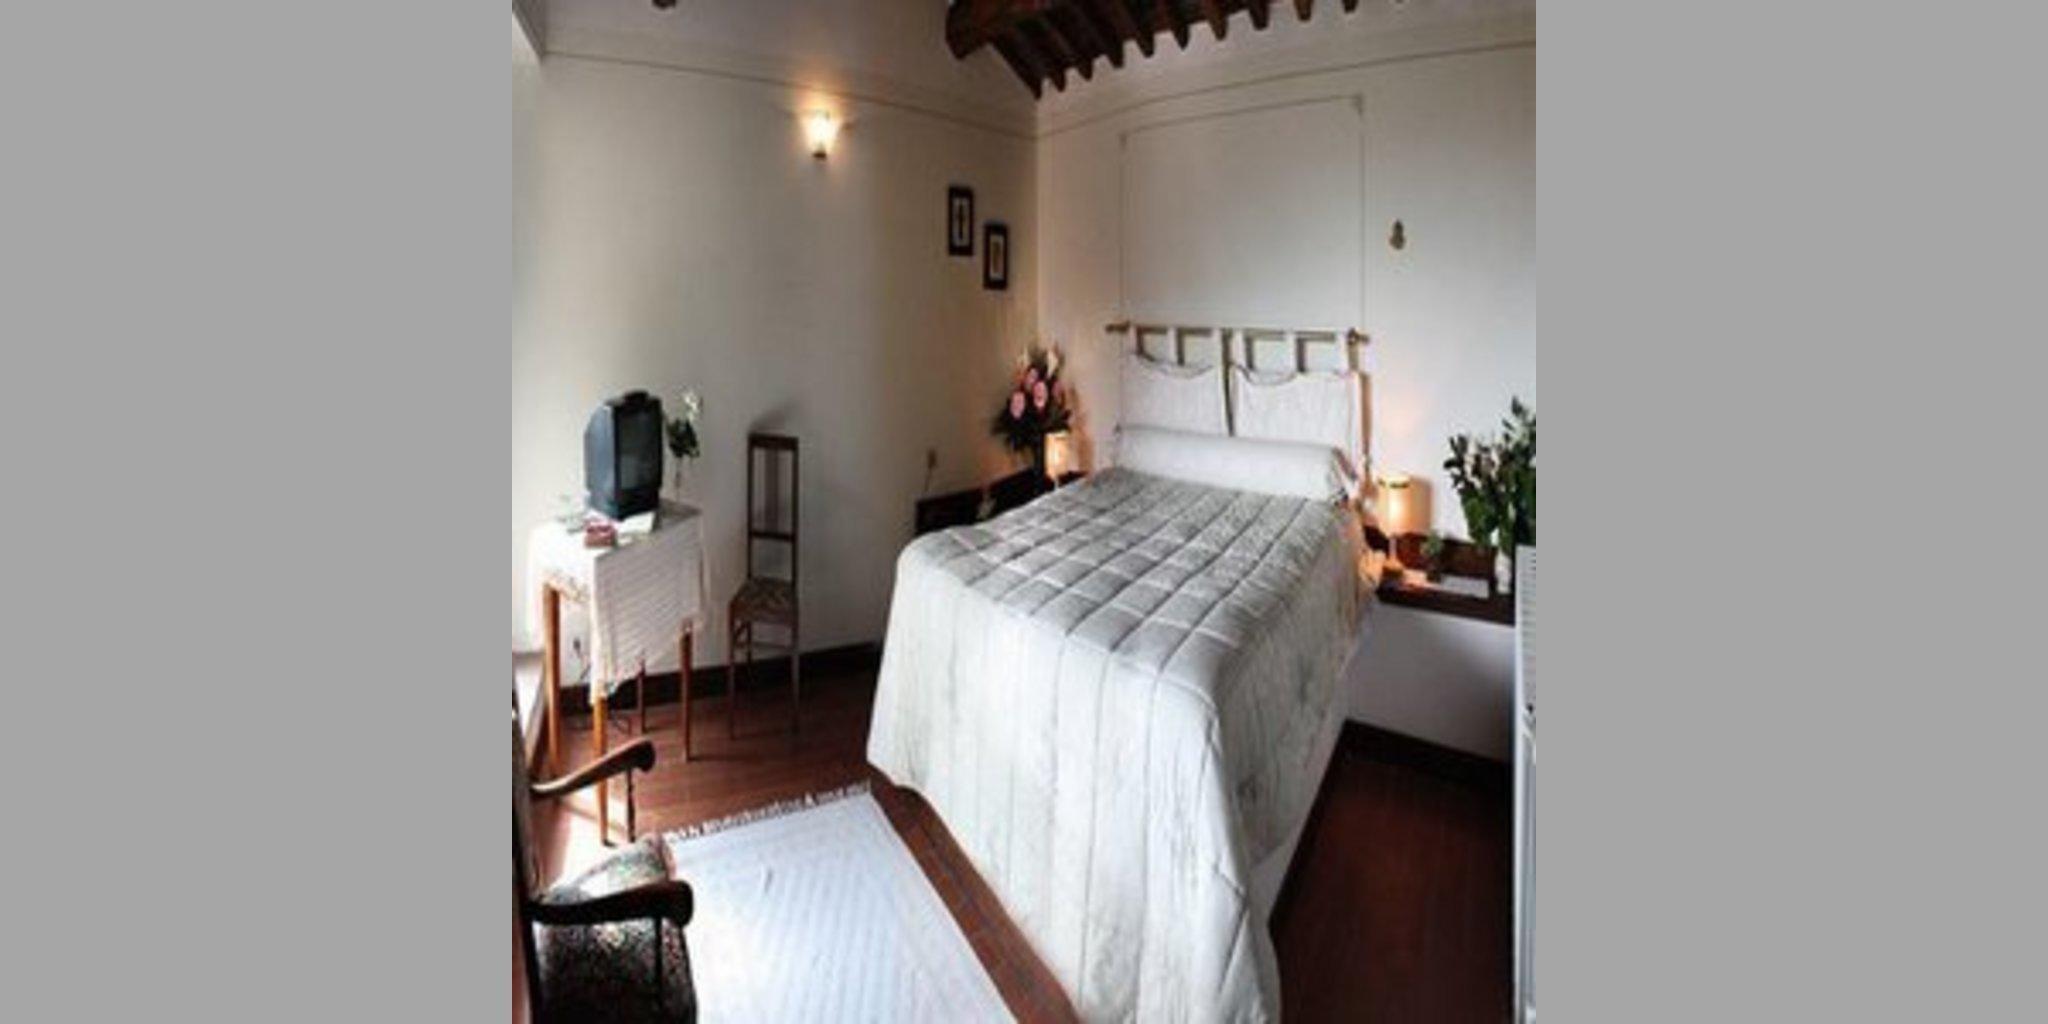 Bed & Breakfast Castelnuovo Berardenga - Corsignano